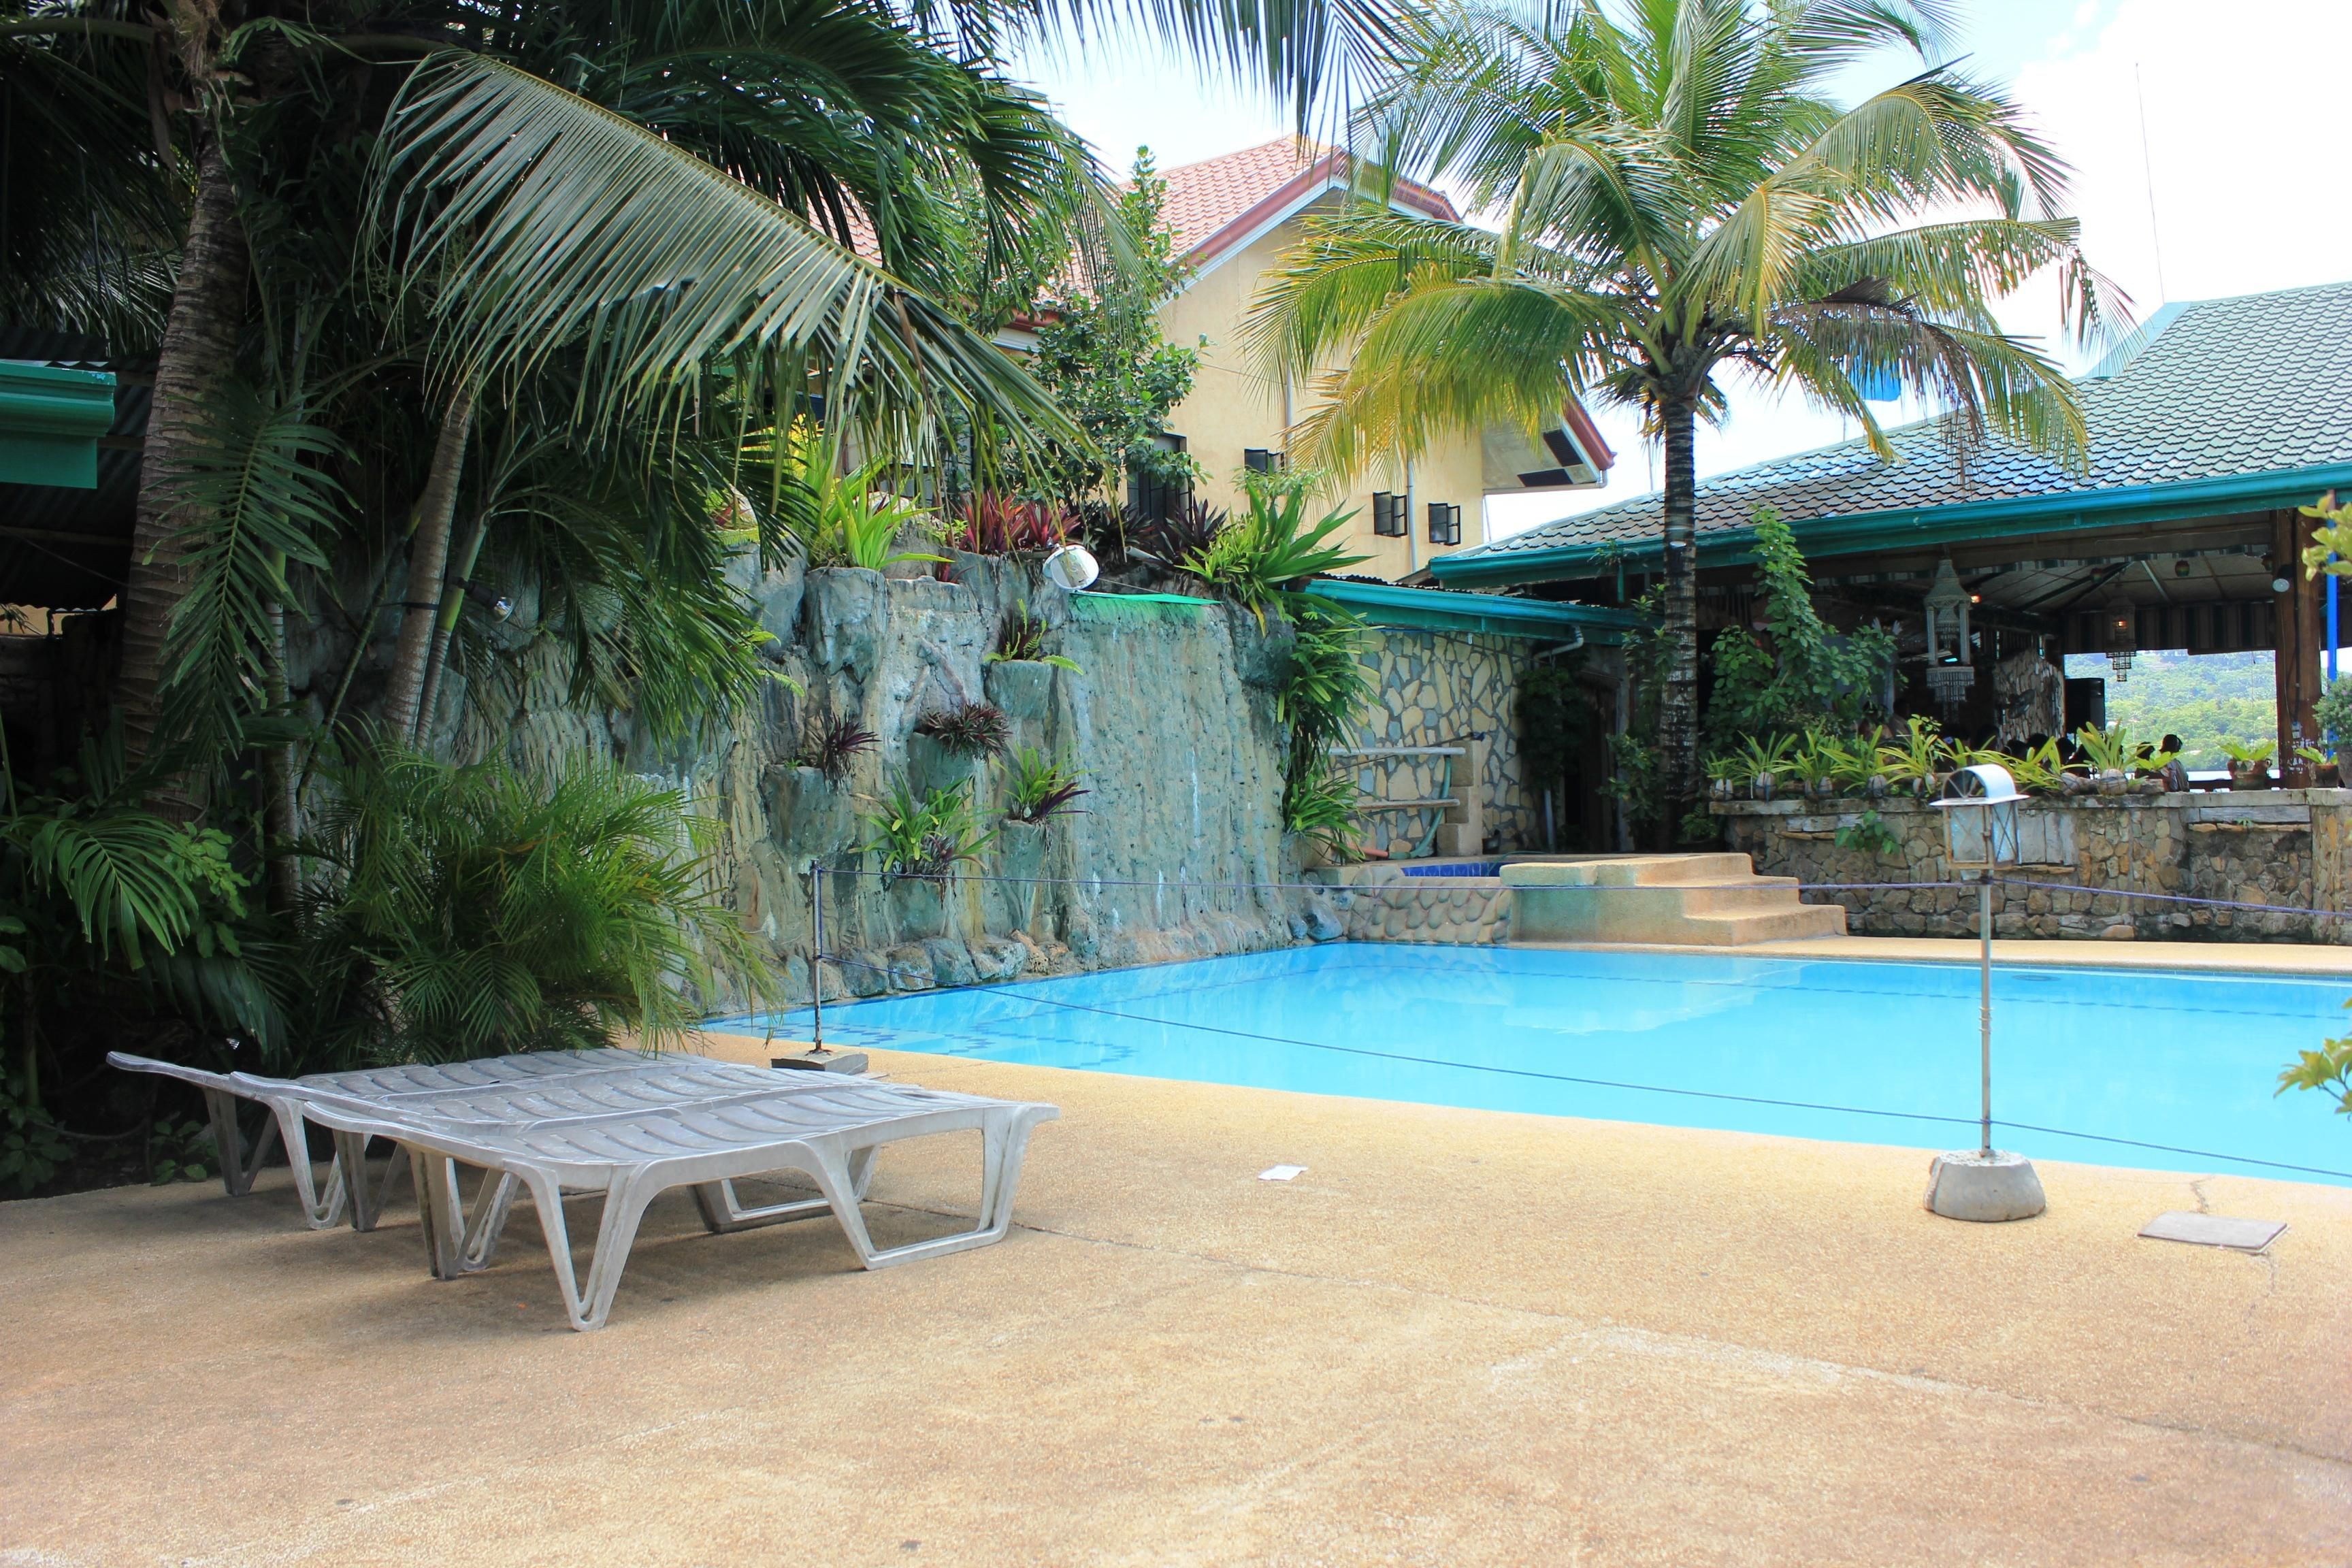 Villa Alzhun Tourist Inn and Restaurant